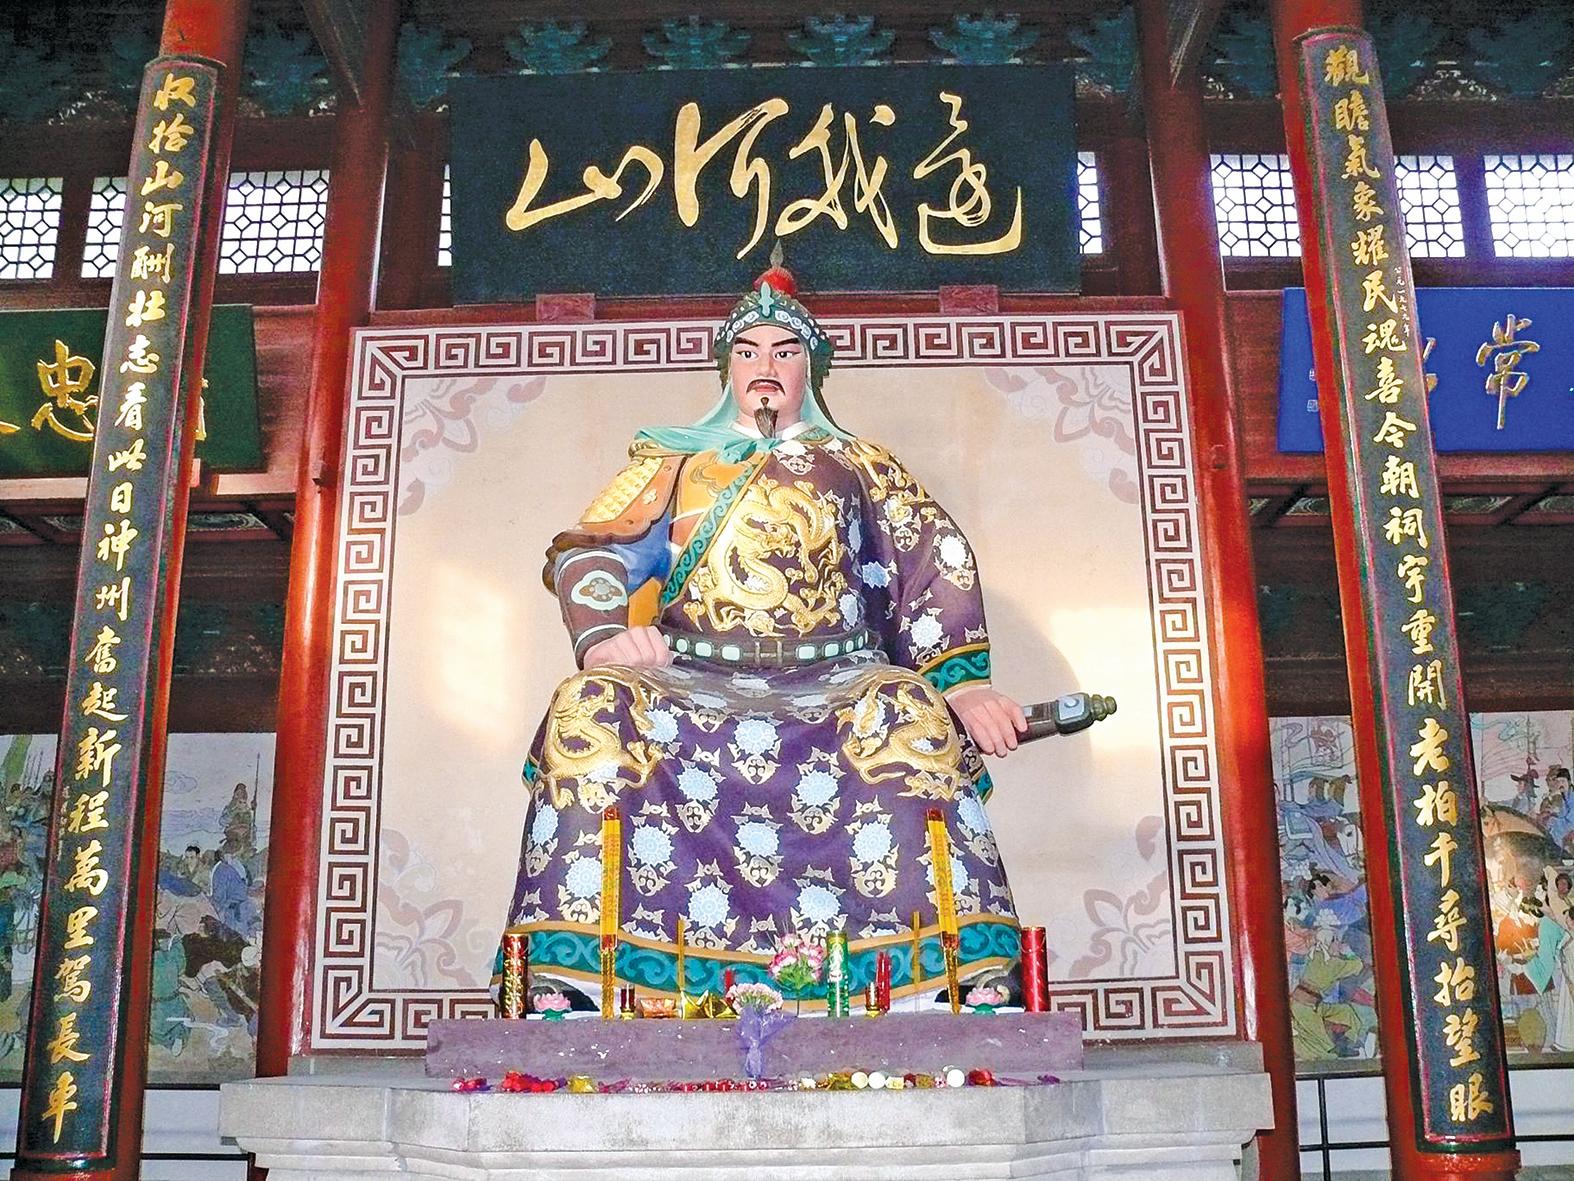 杭州岳王廟中的岳飛塑像。(Peter Potrowl/Wikimedia Commons)